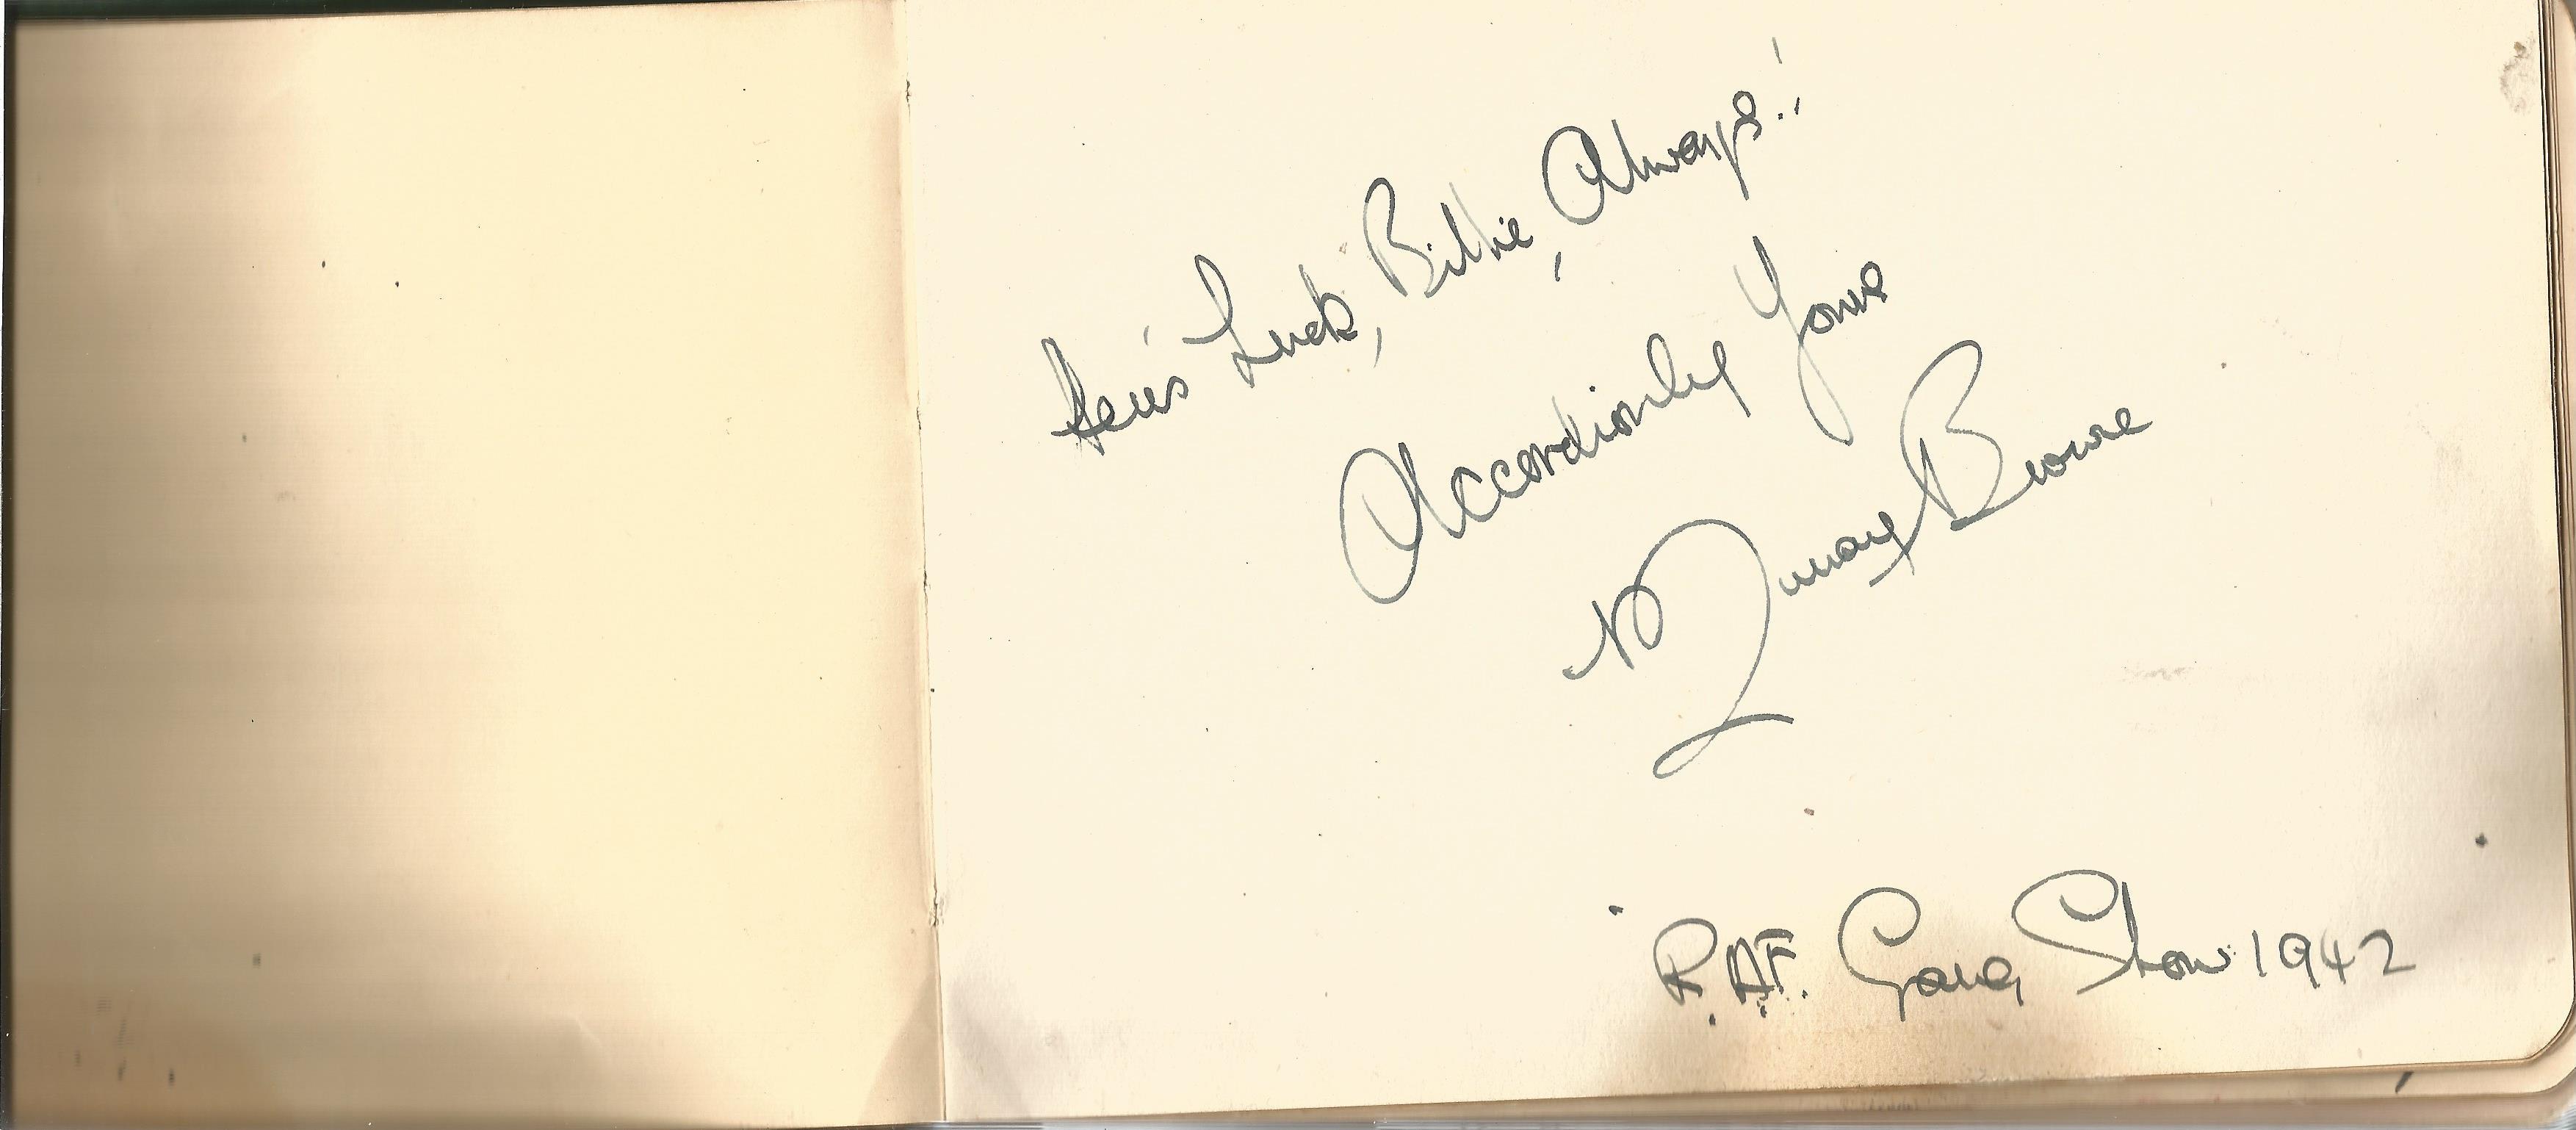 RAF Scampton. 1940-43. Autograph Album. 19cm wide x 13cm tall. Green cloth. Over 250 signatures. - Image 4 of 6